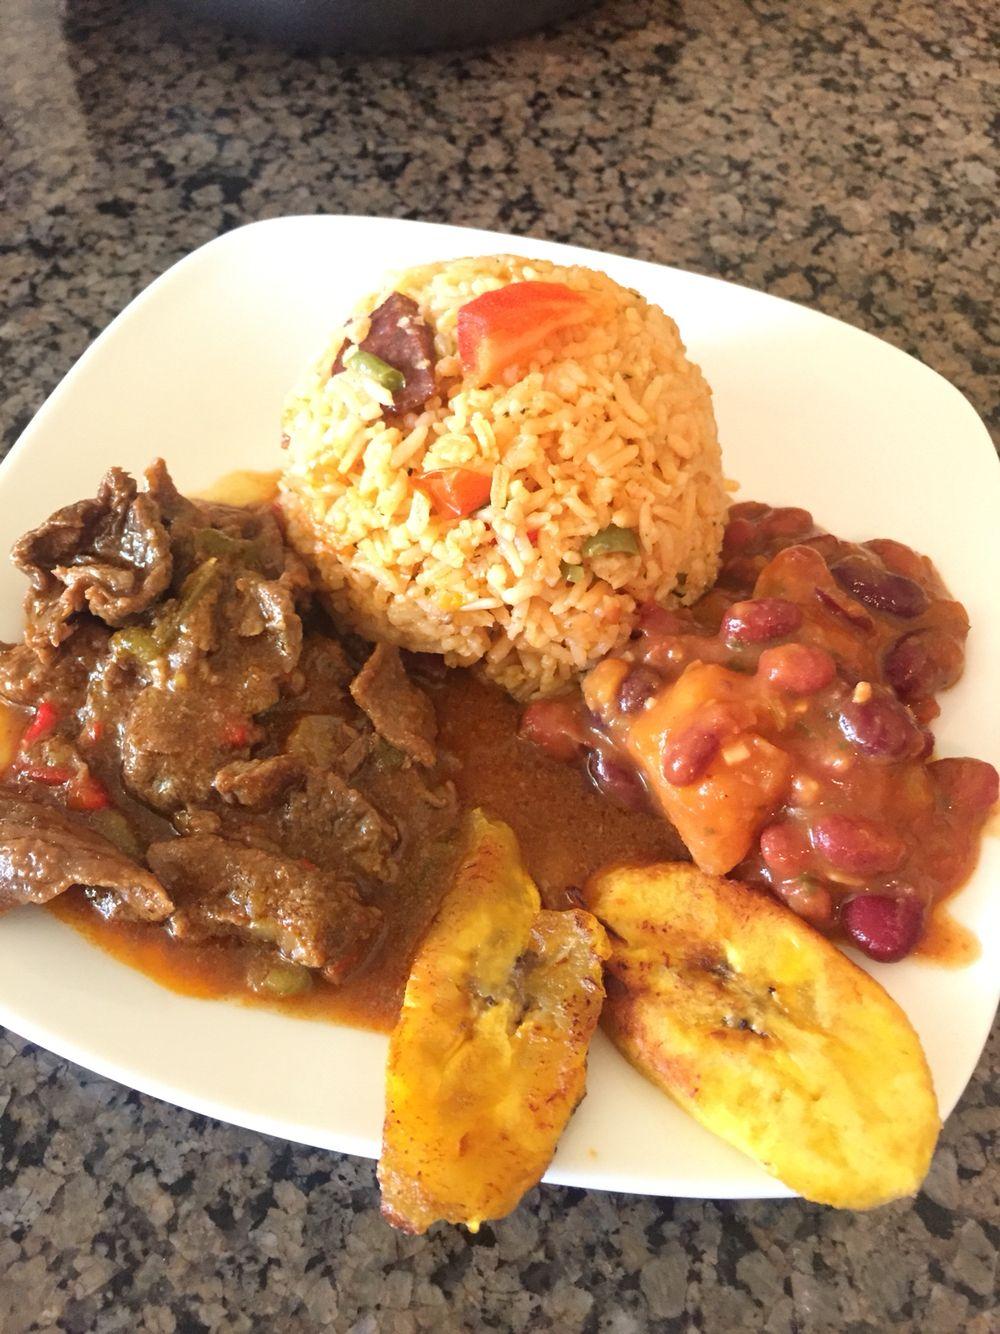 Steak In Sauce Spanish Rice Beans Plantains Cooking Recipes Spanish Rice And Beans Recipes